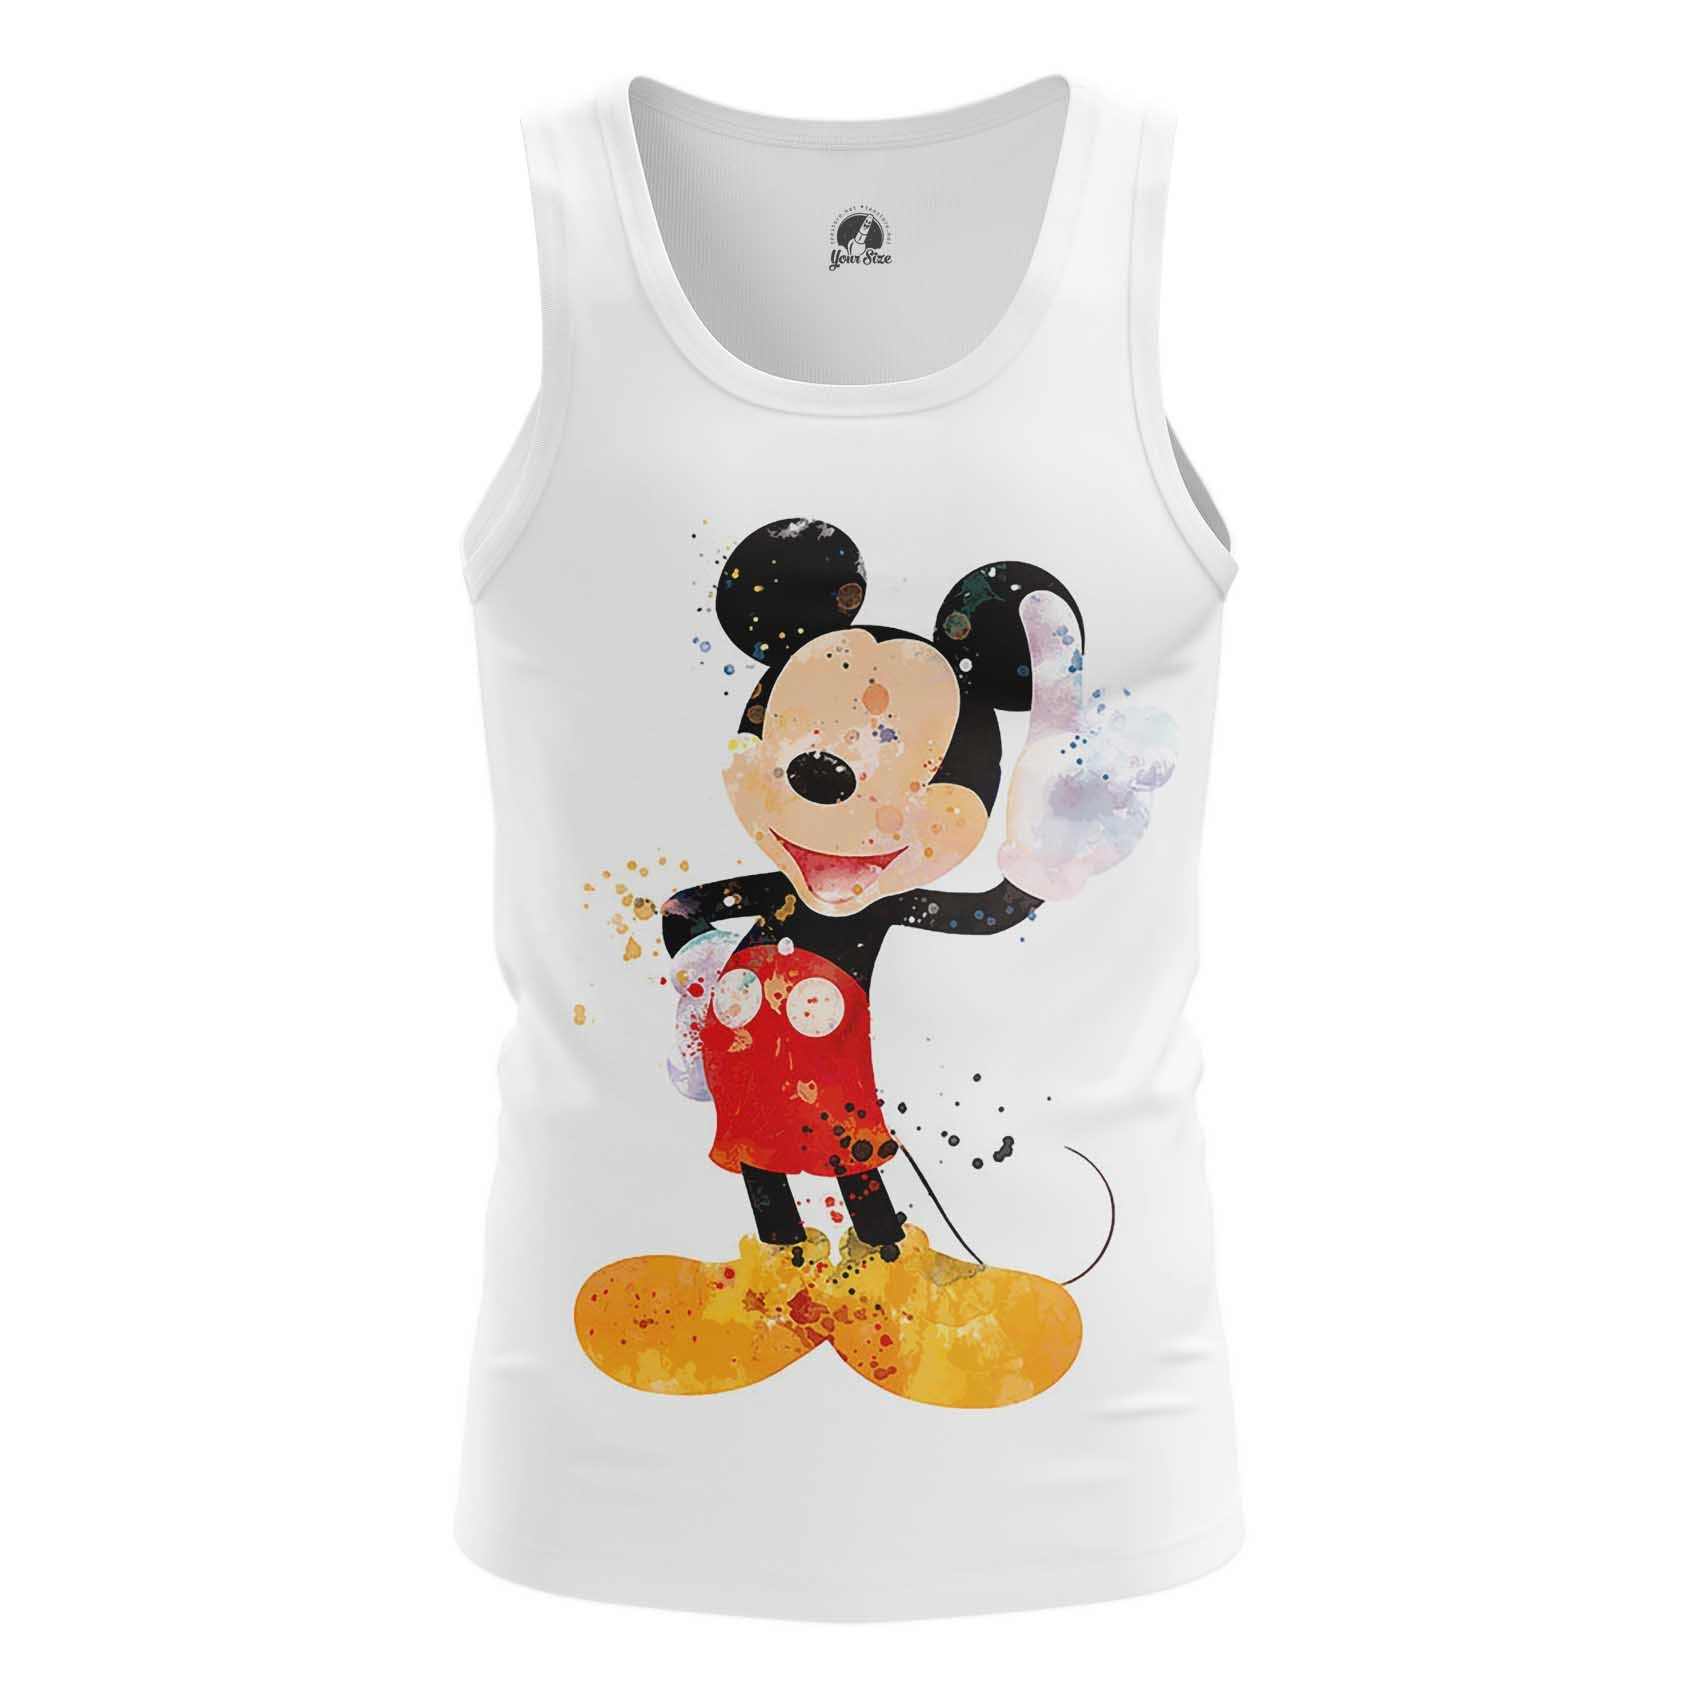 Merch Men'S T-Shirt Mickey Mouse Disney Clothing Arts